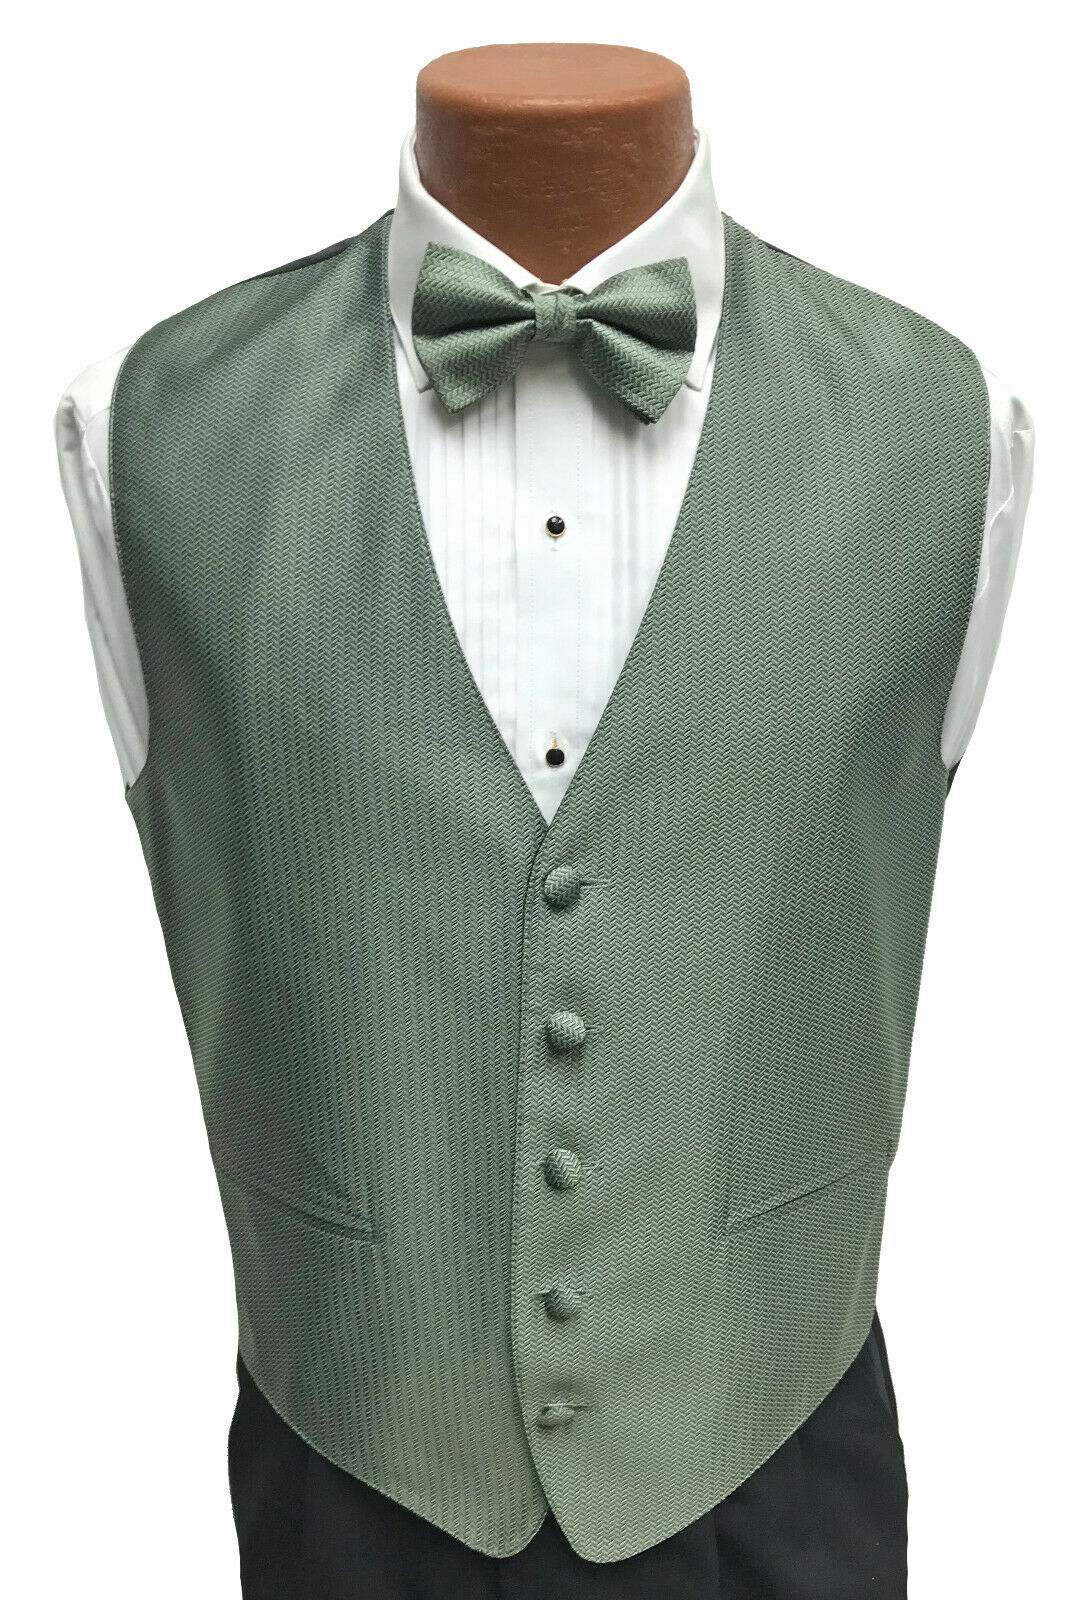 Men's Sage Green Herringbone Tuxedo Vest & Tie Fullback Formal Wedding Groom